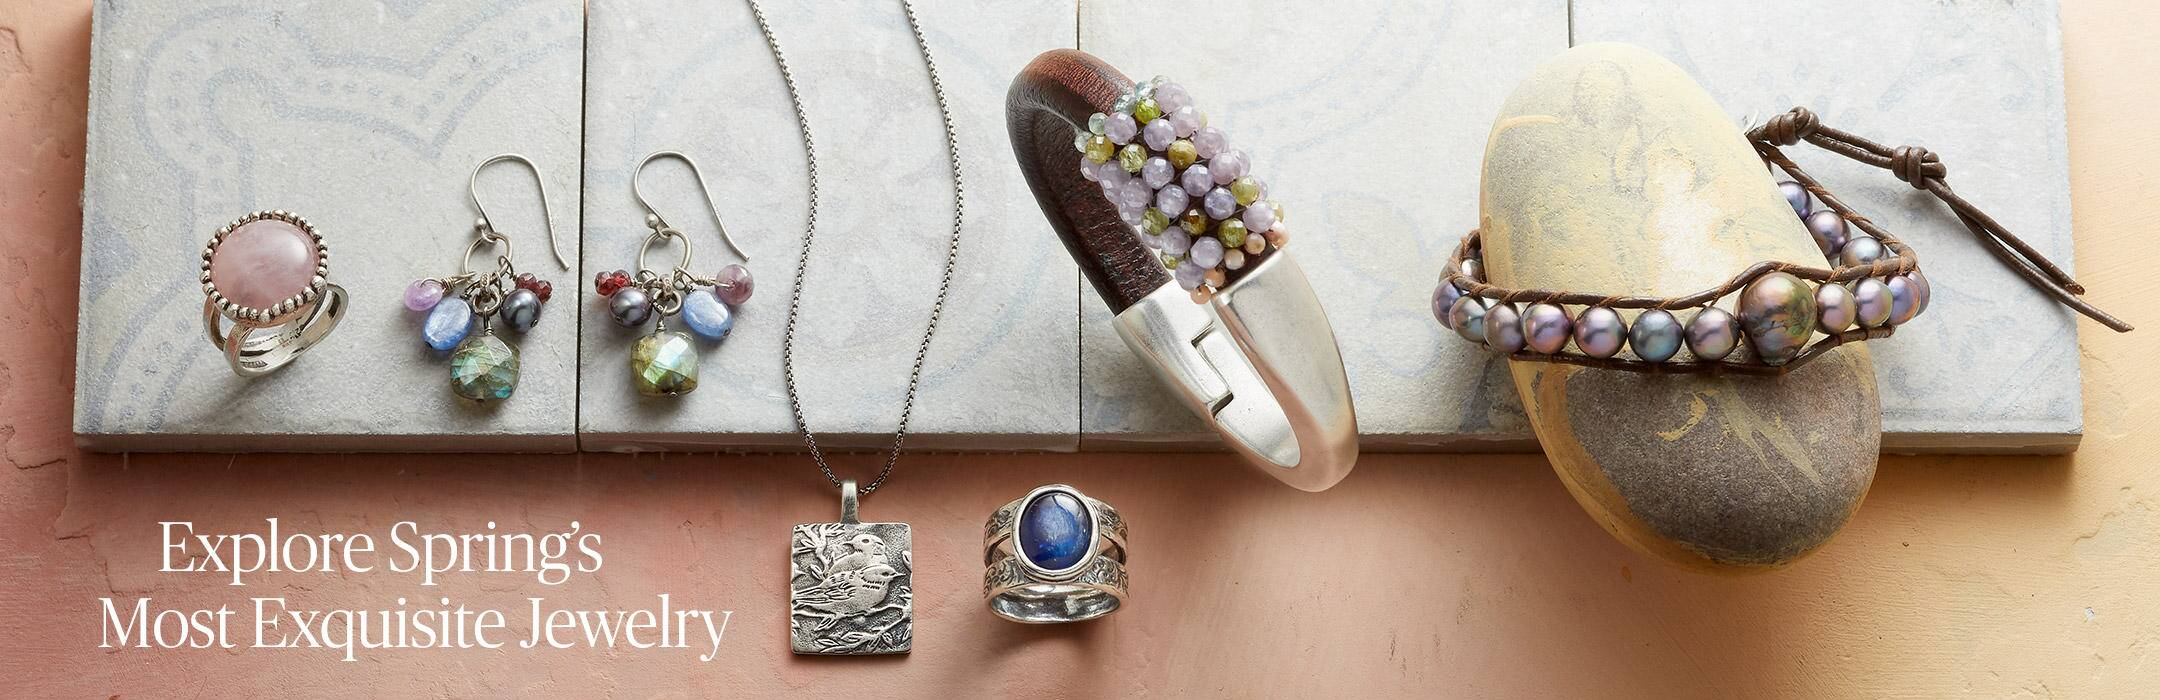 Explore Spring's Most Exquisite Jewelry